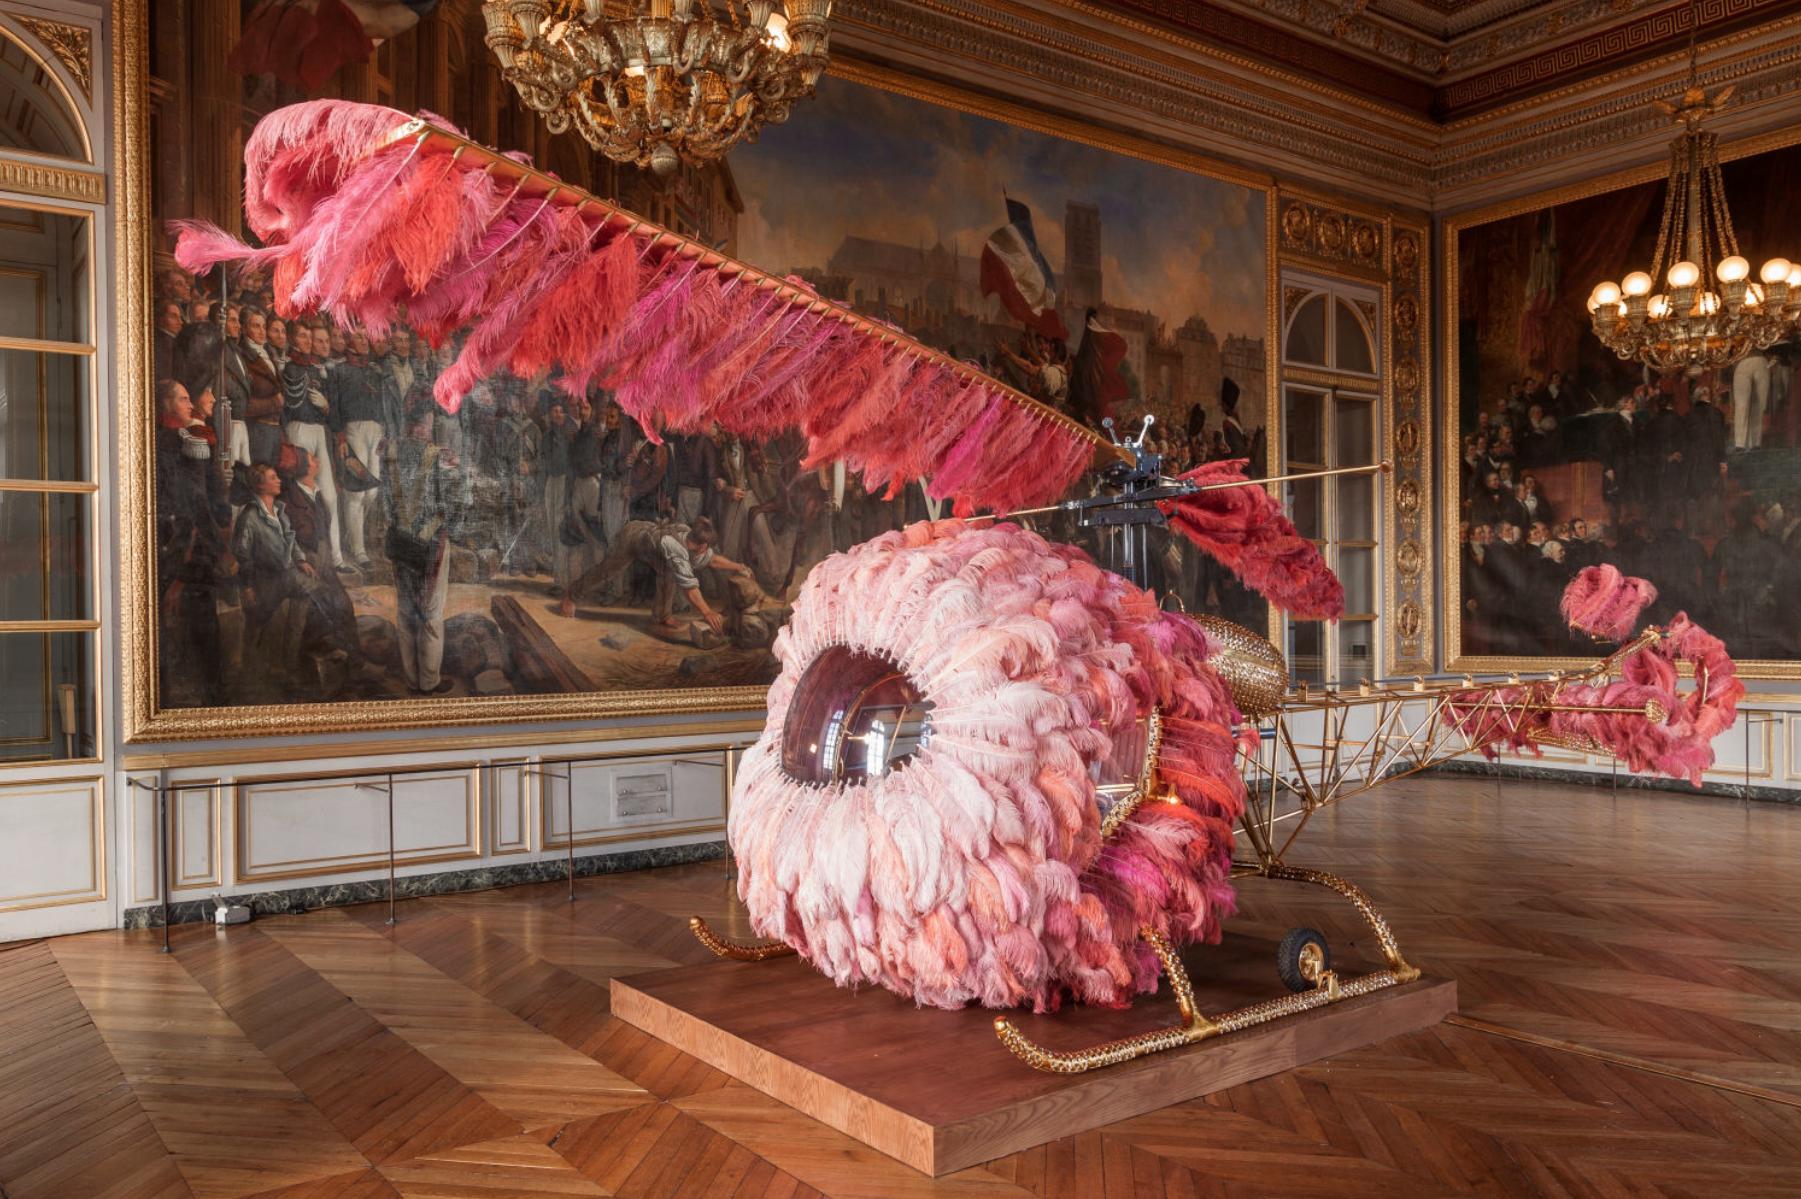 Joana Vasconcelos – Sculpture Lilicoptere